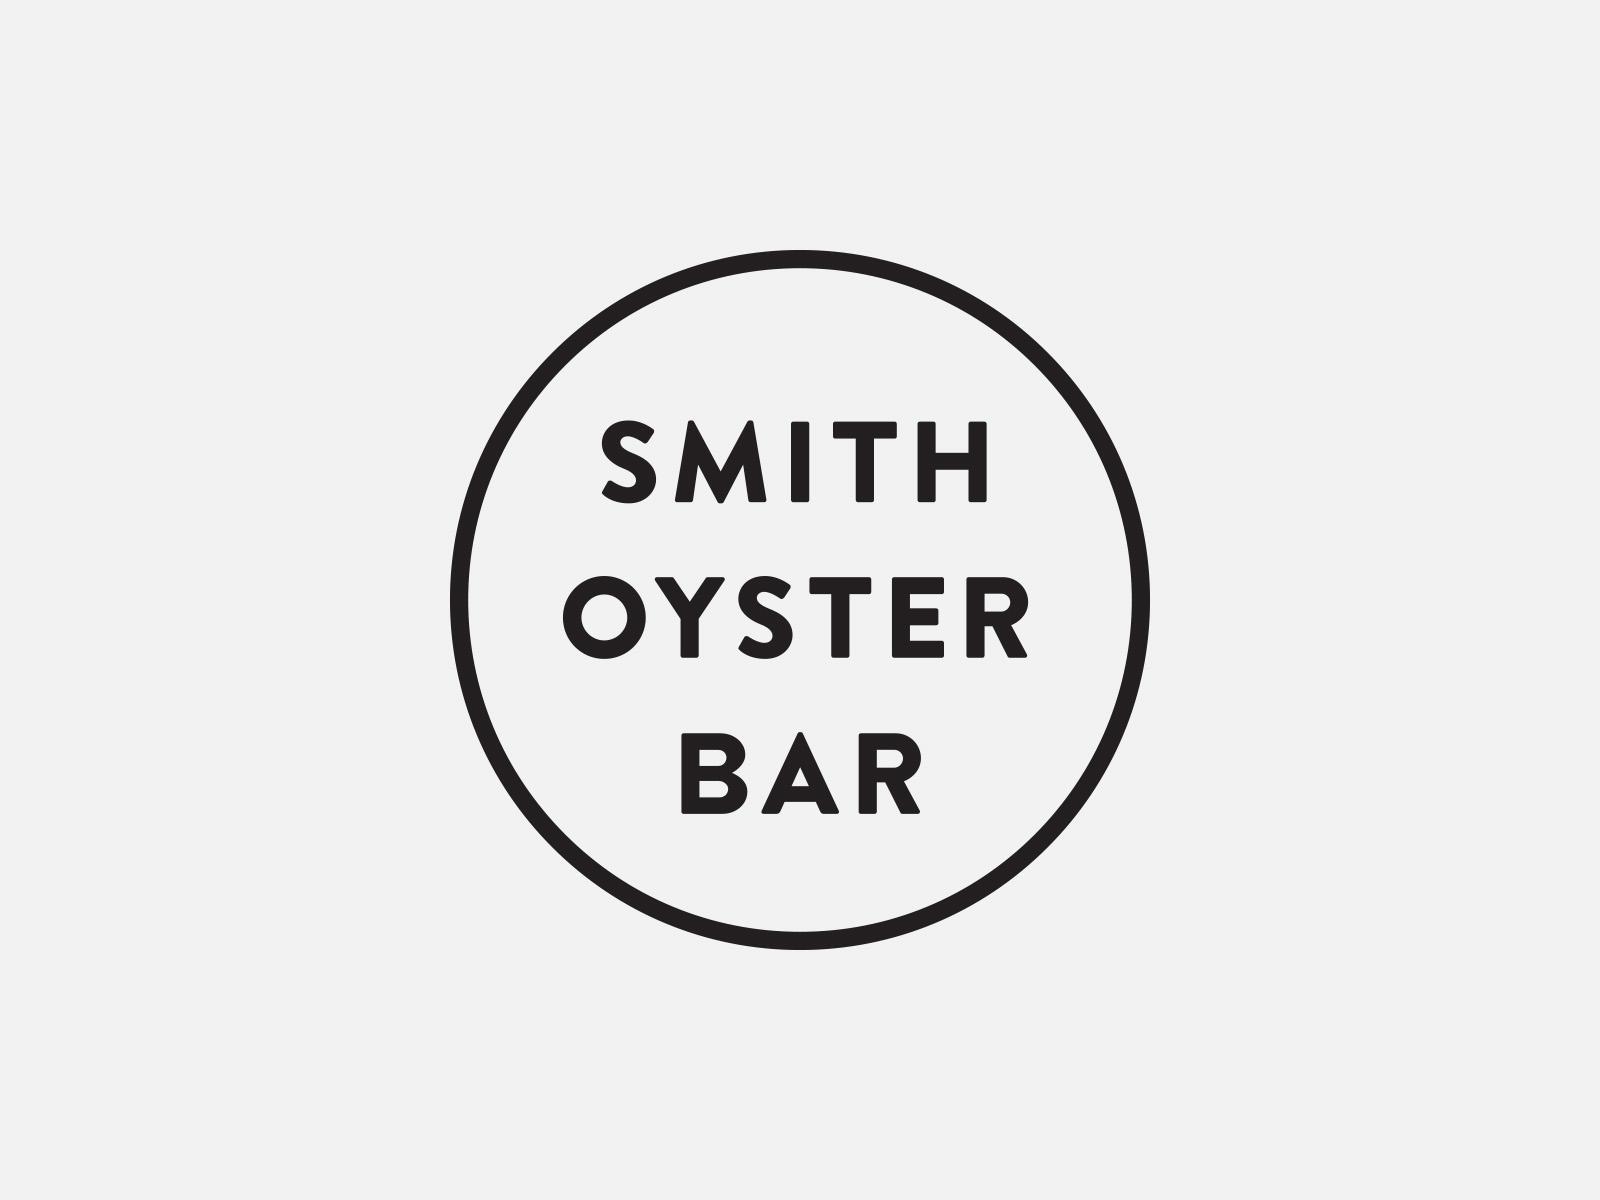 Smith Oyster Bar by Leo Burnett Design